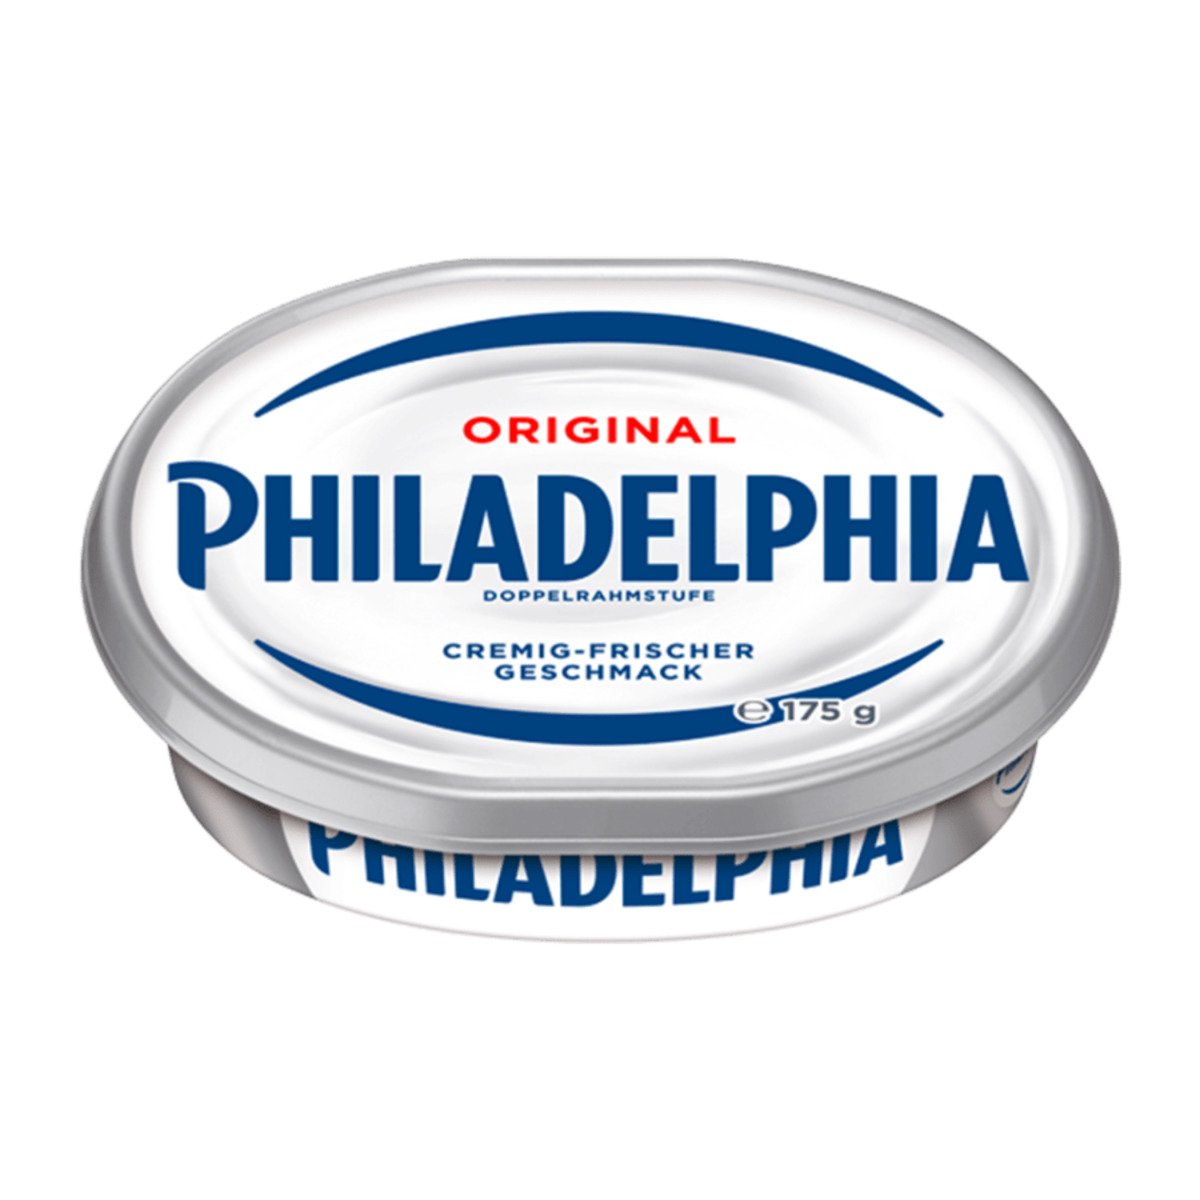 Bild 5 von Philadelphia